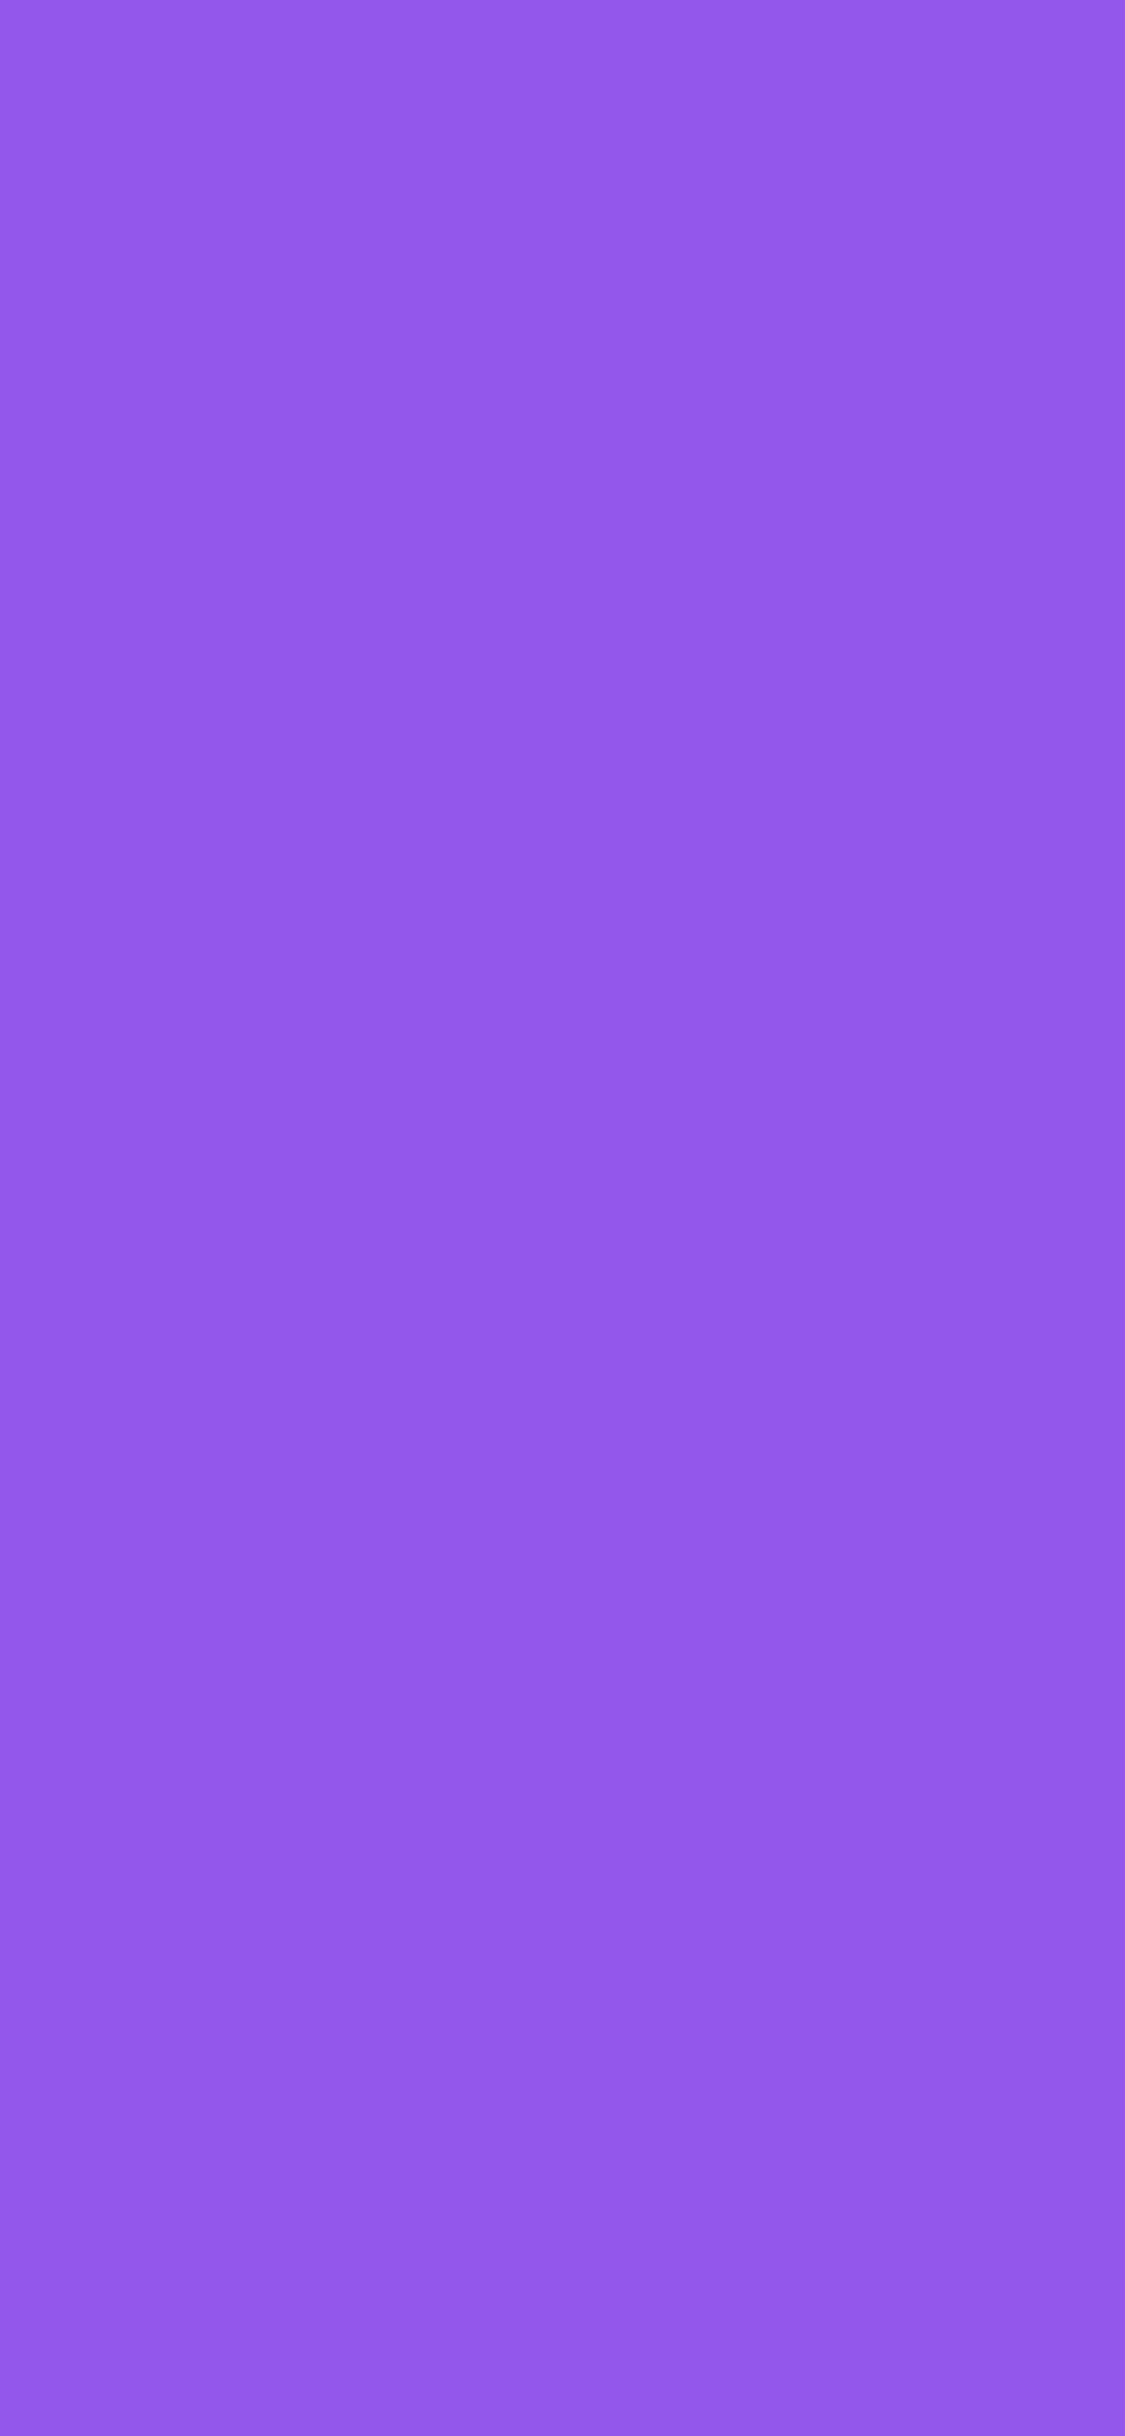 1125x2436 Lavender Indigo Solid Color Background